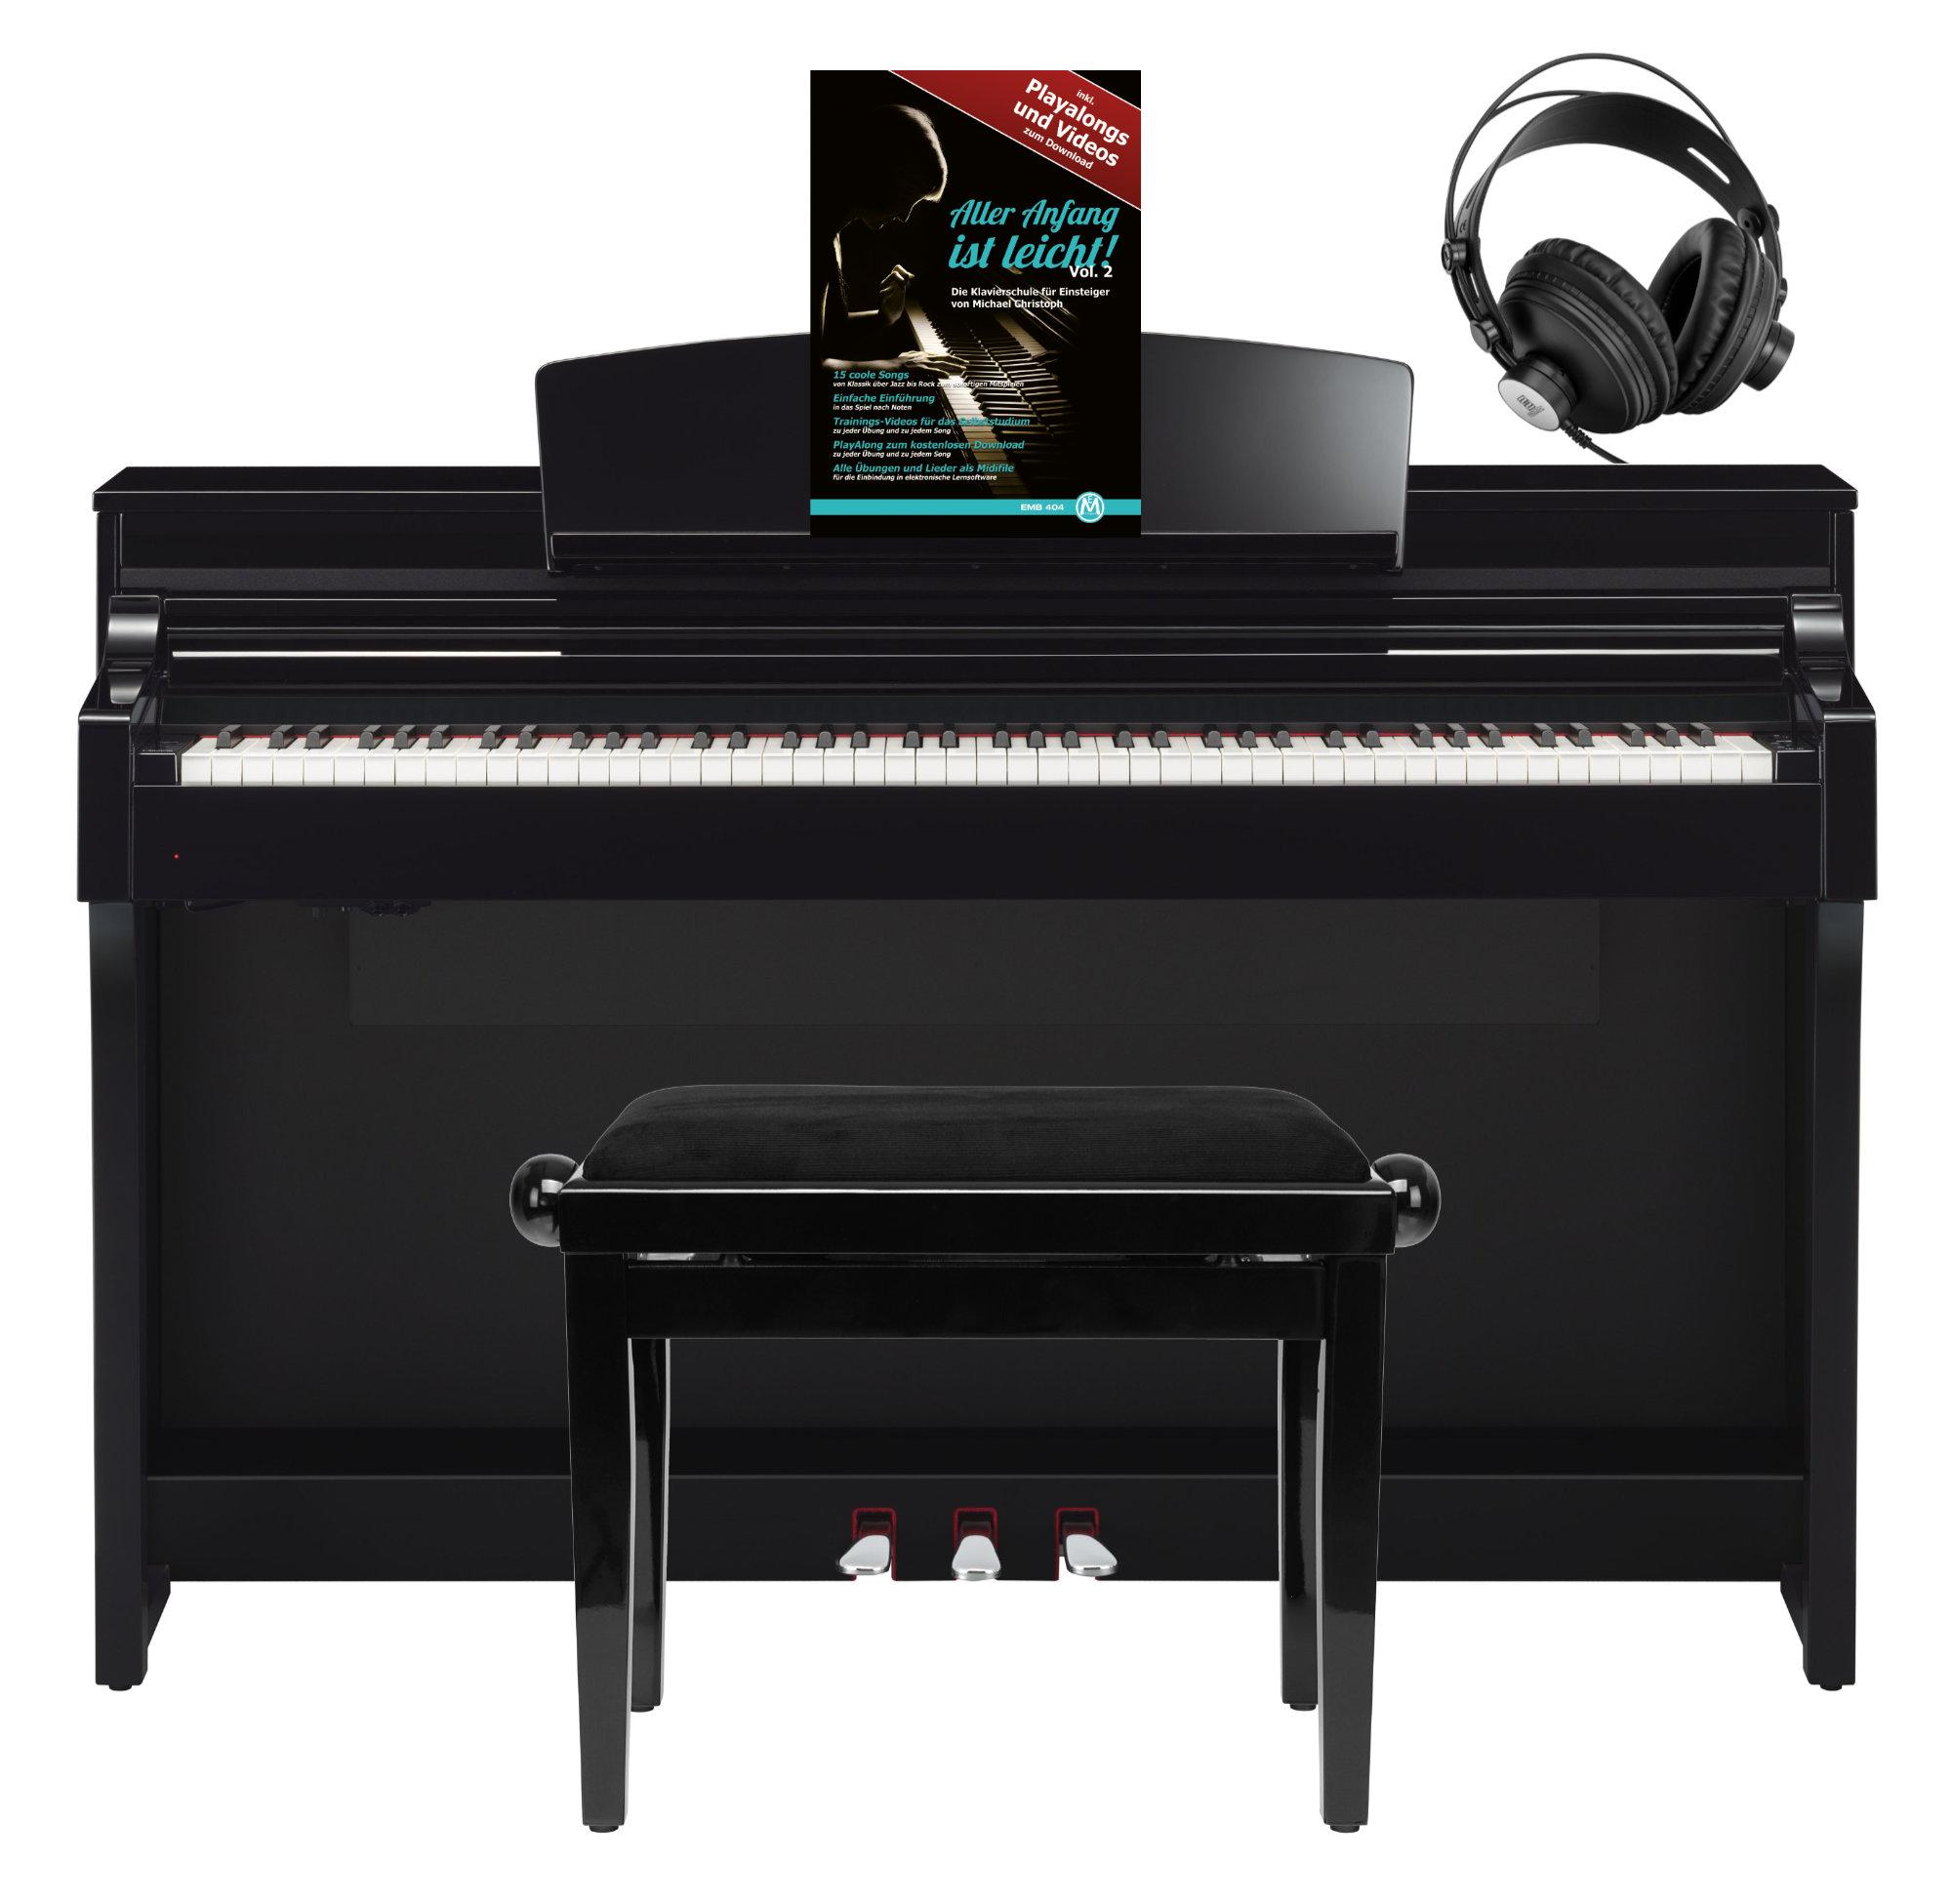 Yamaha CSP 150 PE Digitalpiano Schwarz Hochglanz SET mit Kopfhörer, Bank Schule